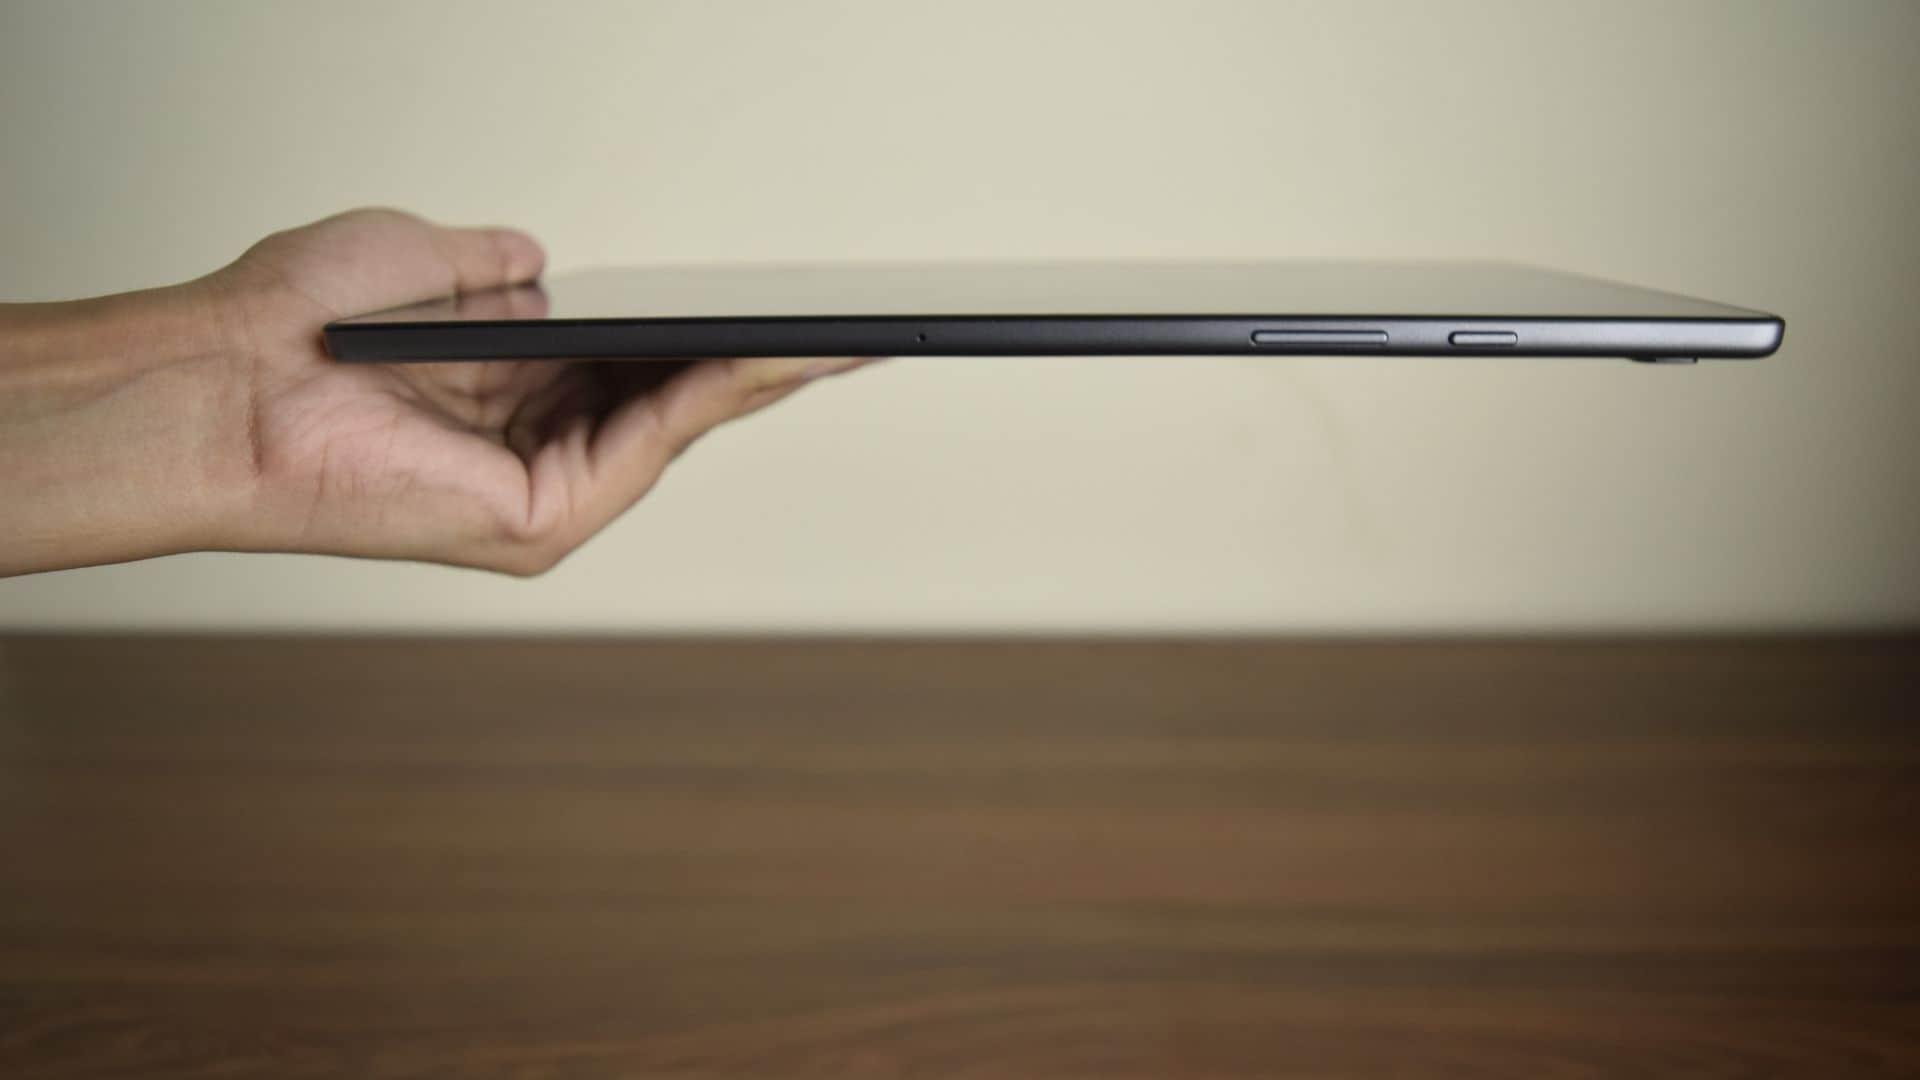 Samsung Galaxy Tab A7 is 7mm thick.